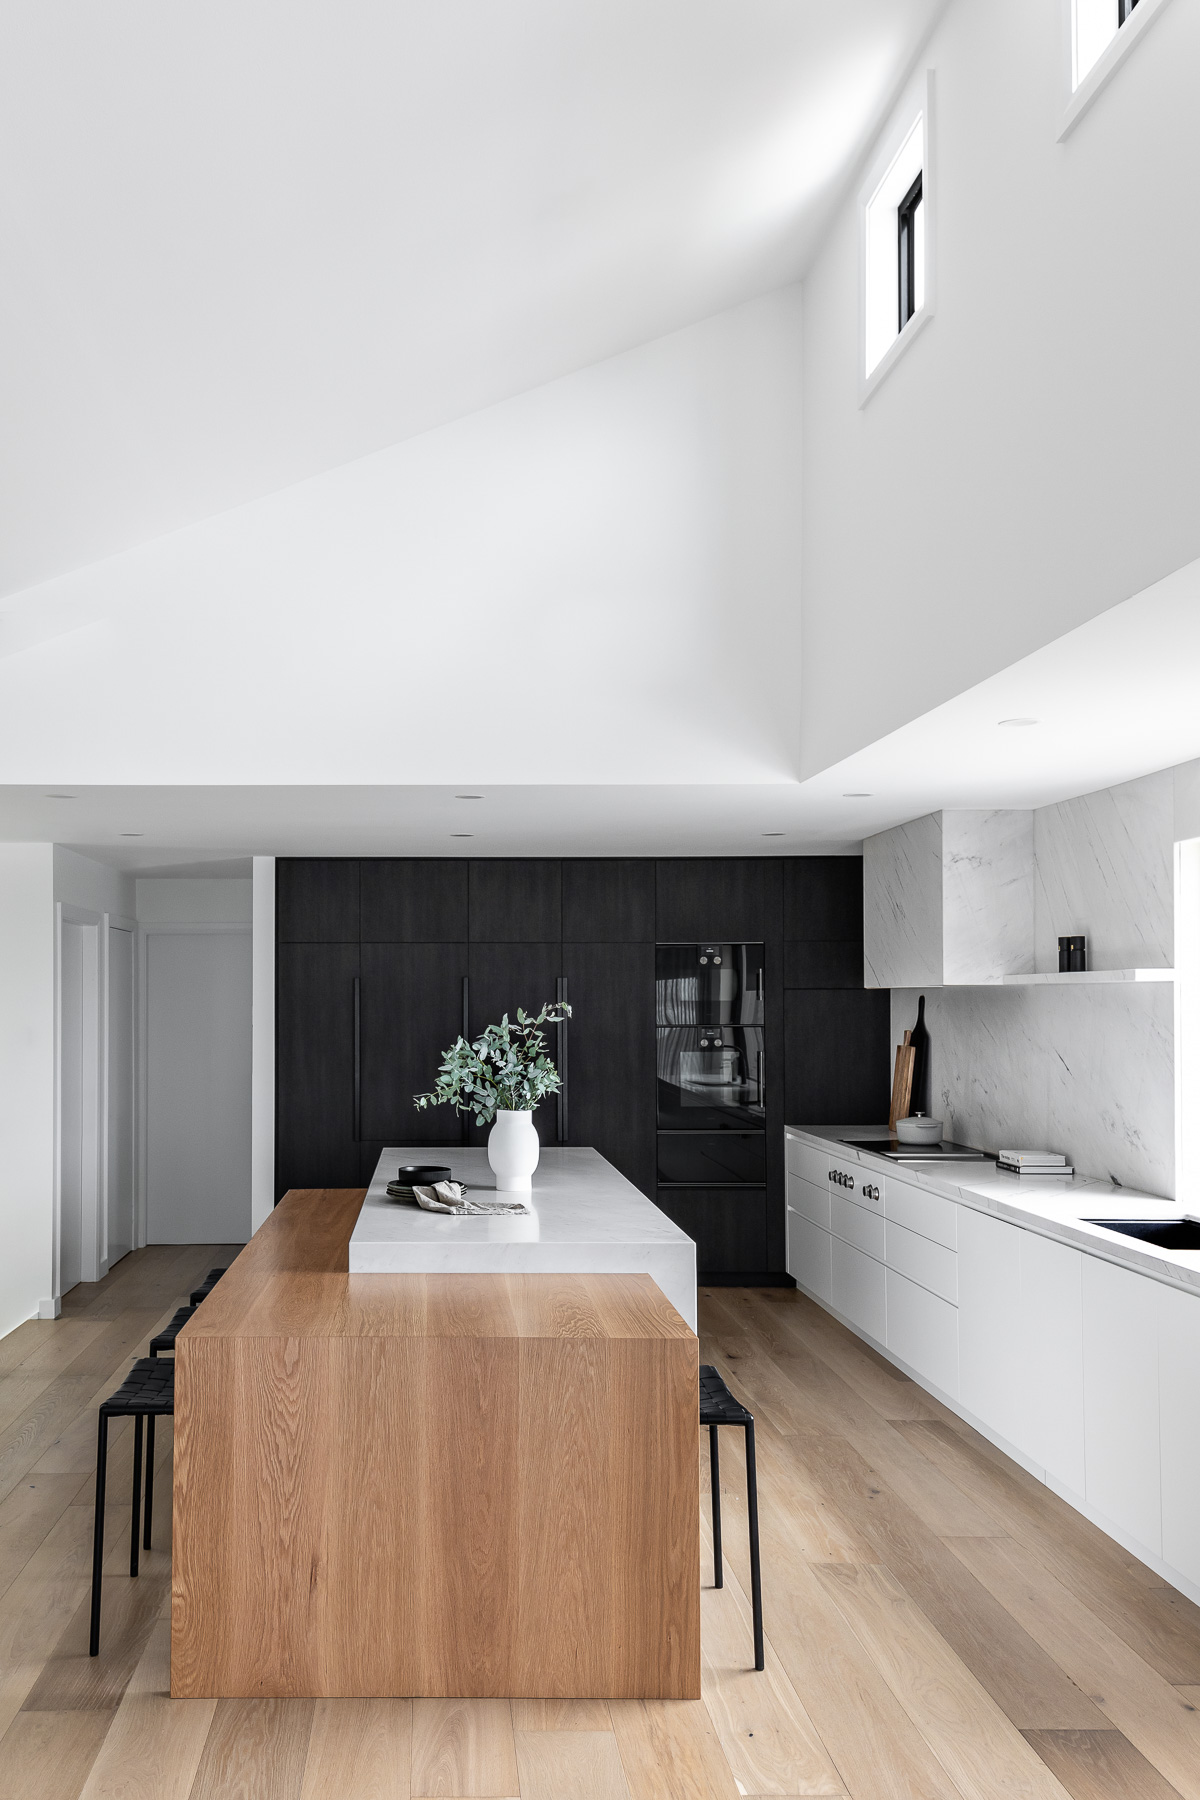 tameka-moffat-design-modern-kitchen-island-bench-dining-table